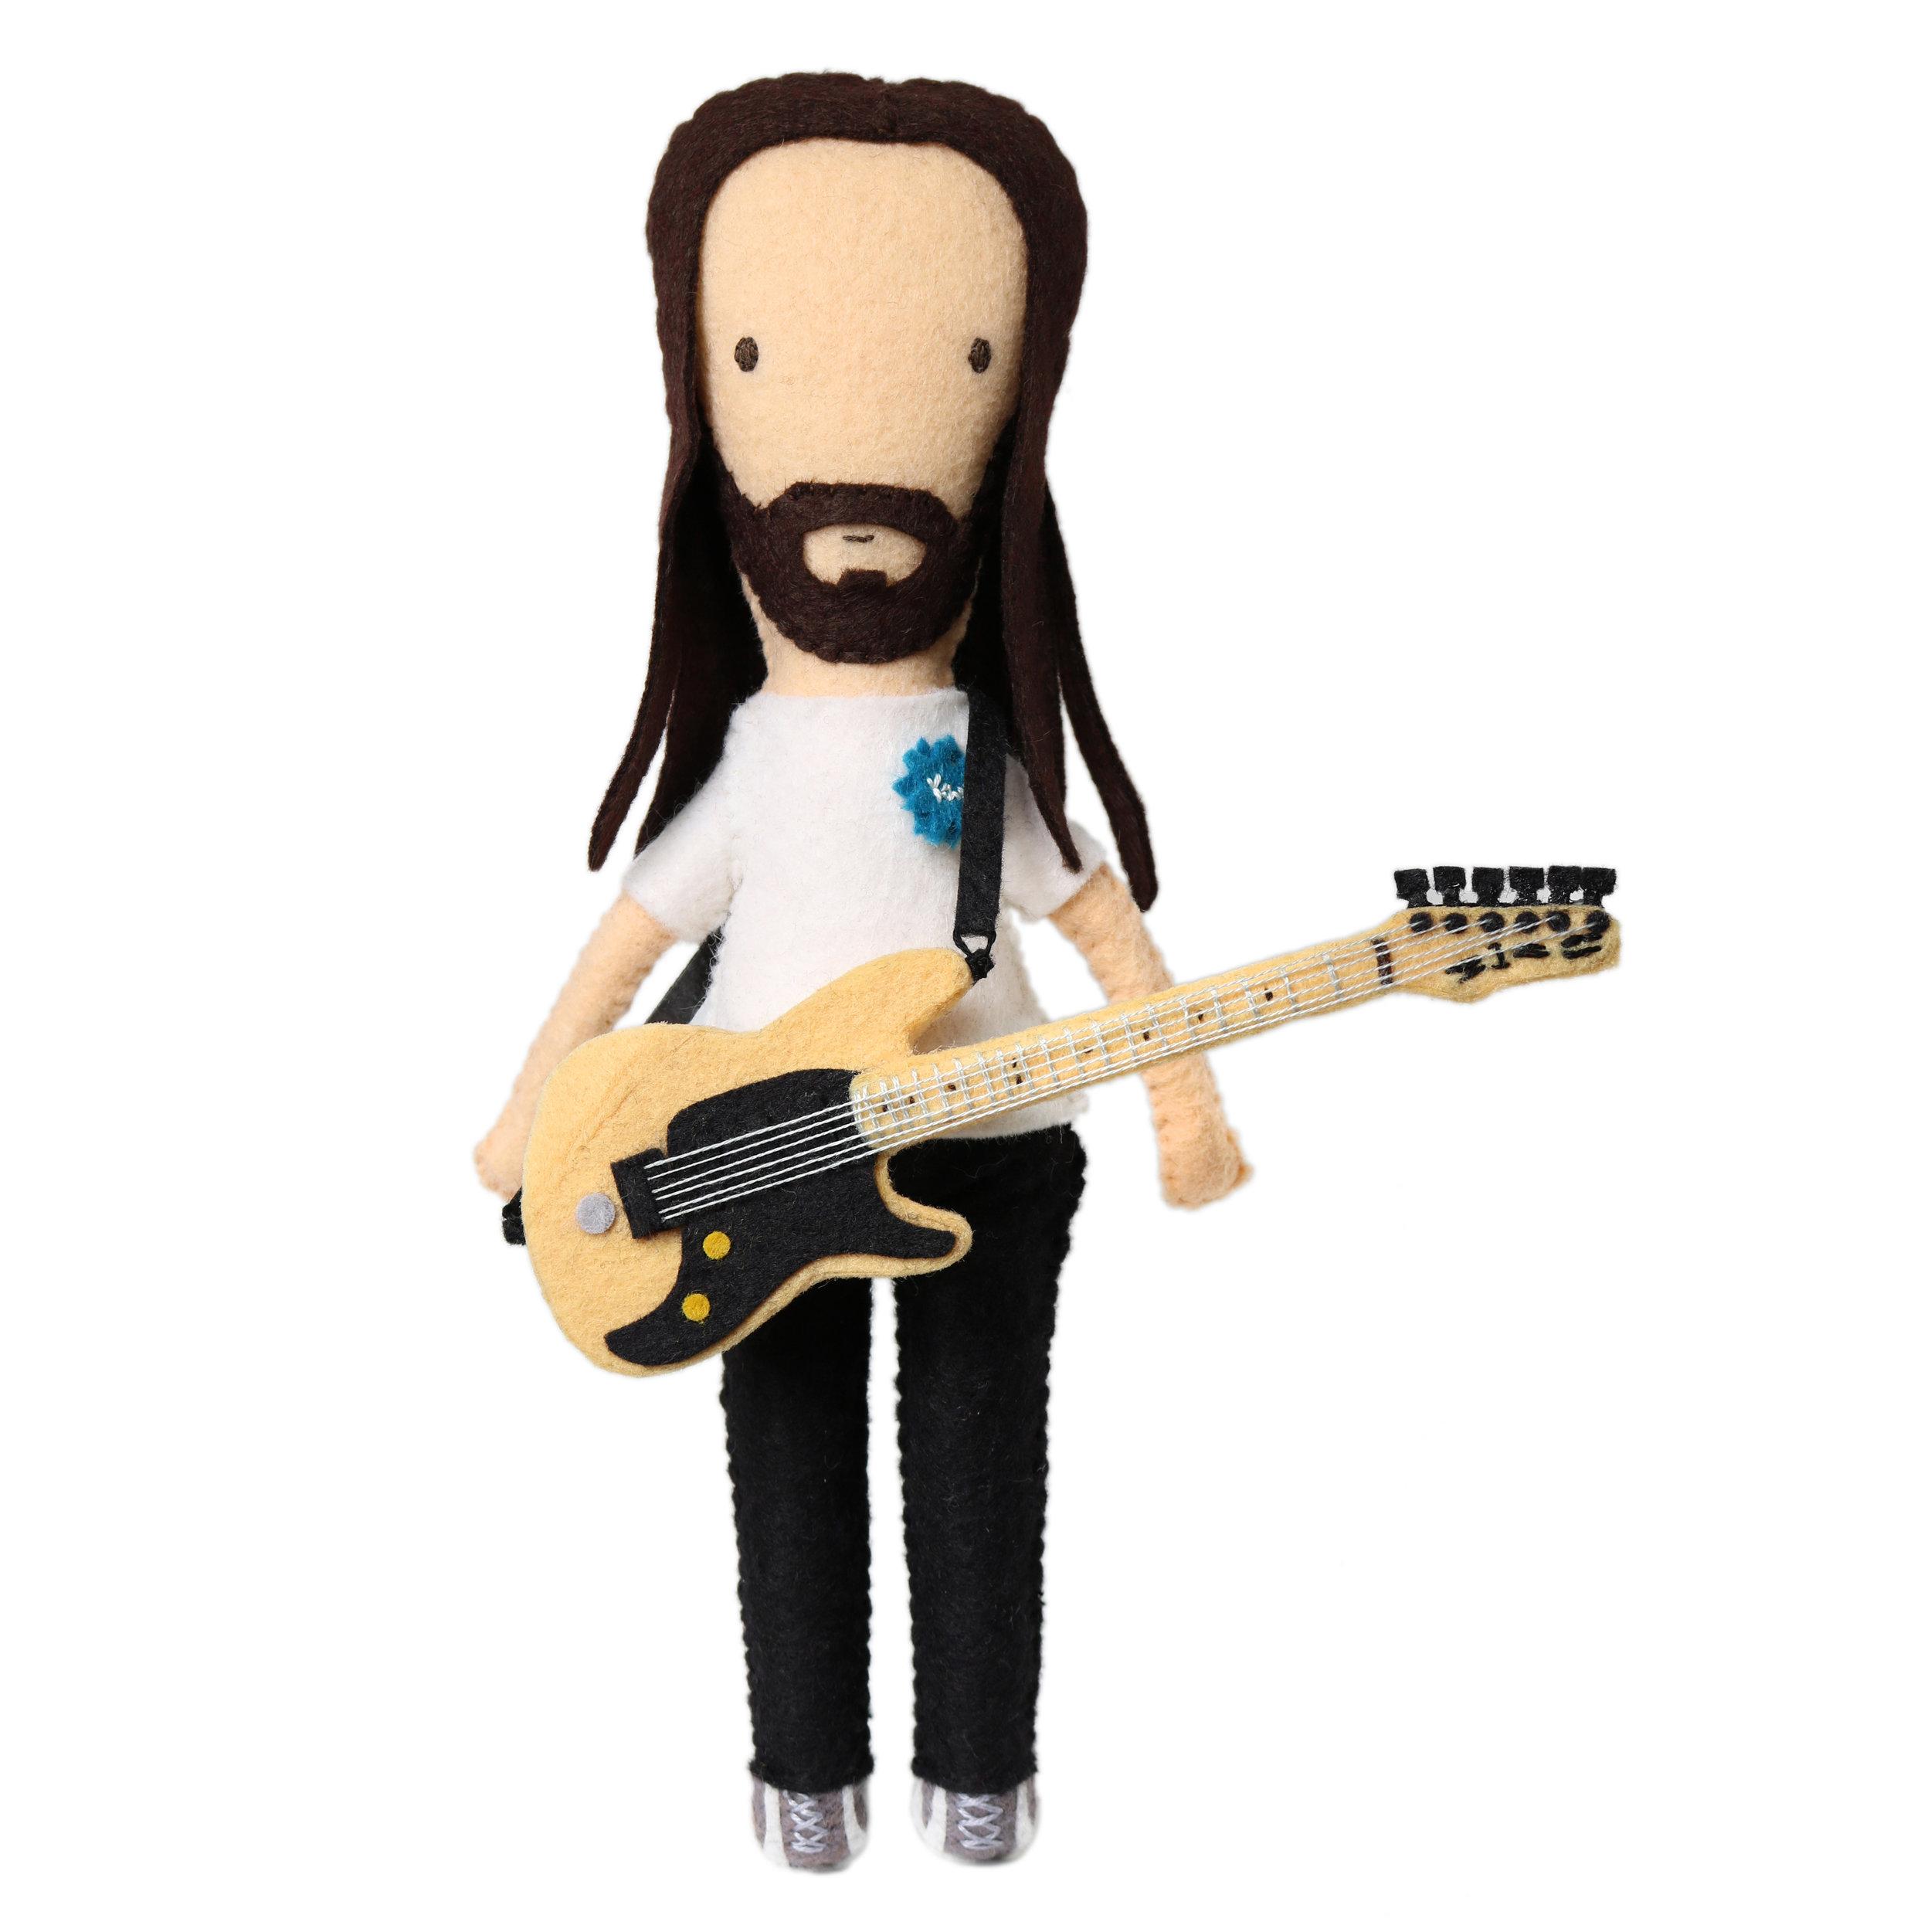 Felt Ibanez Guitar and Moo Doll Portrait